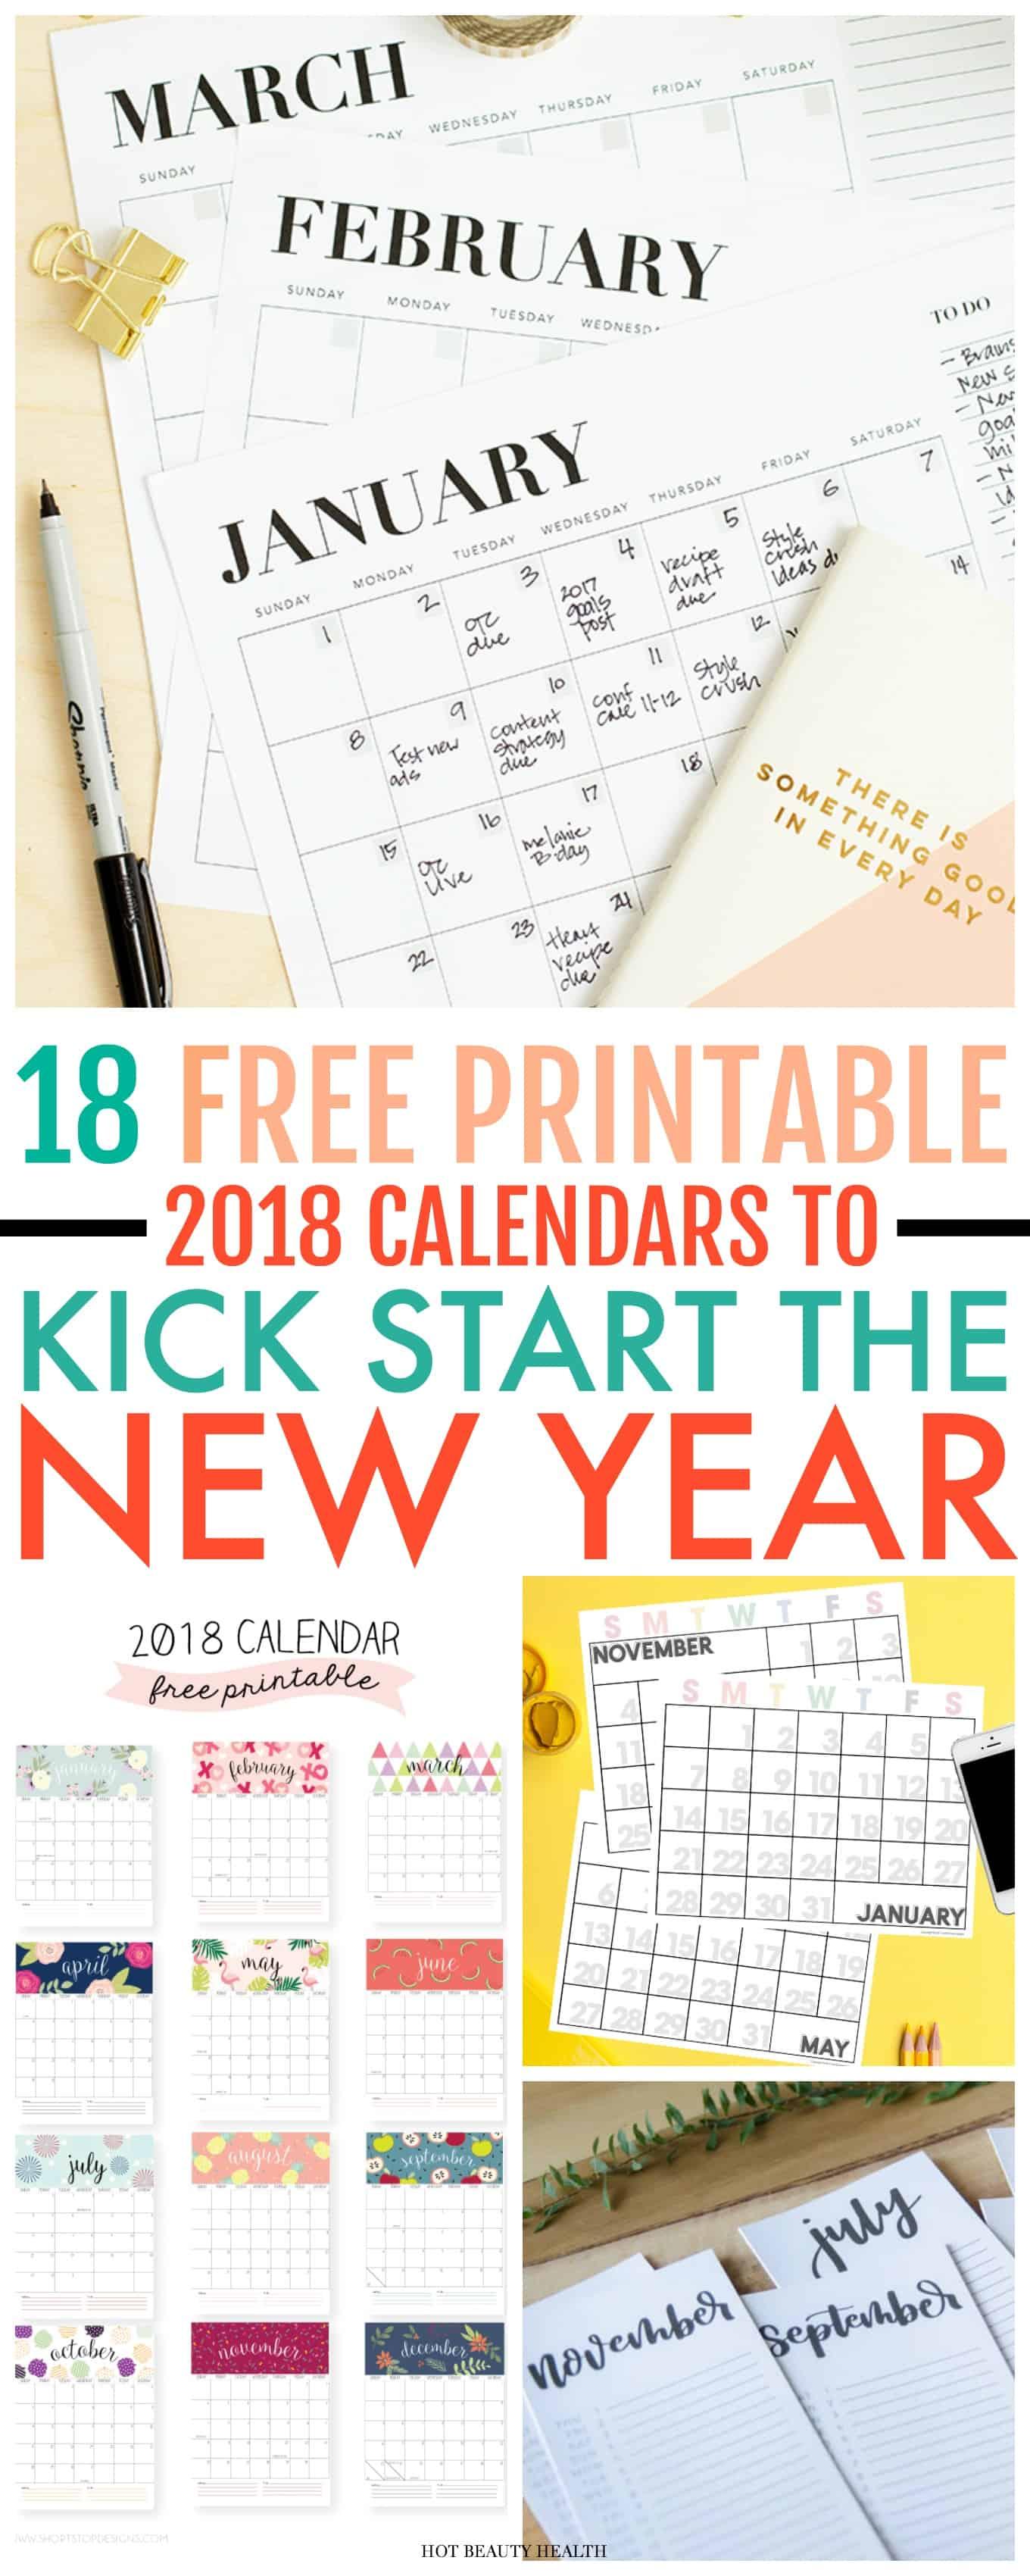 18 Free Printable Calendars To Kick Start The New